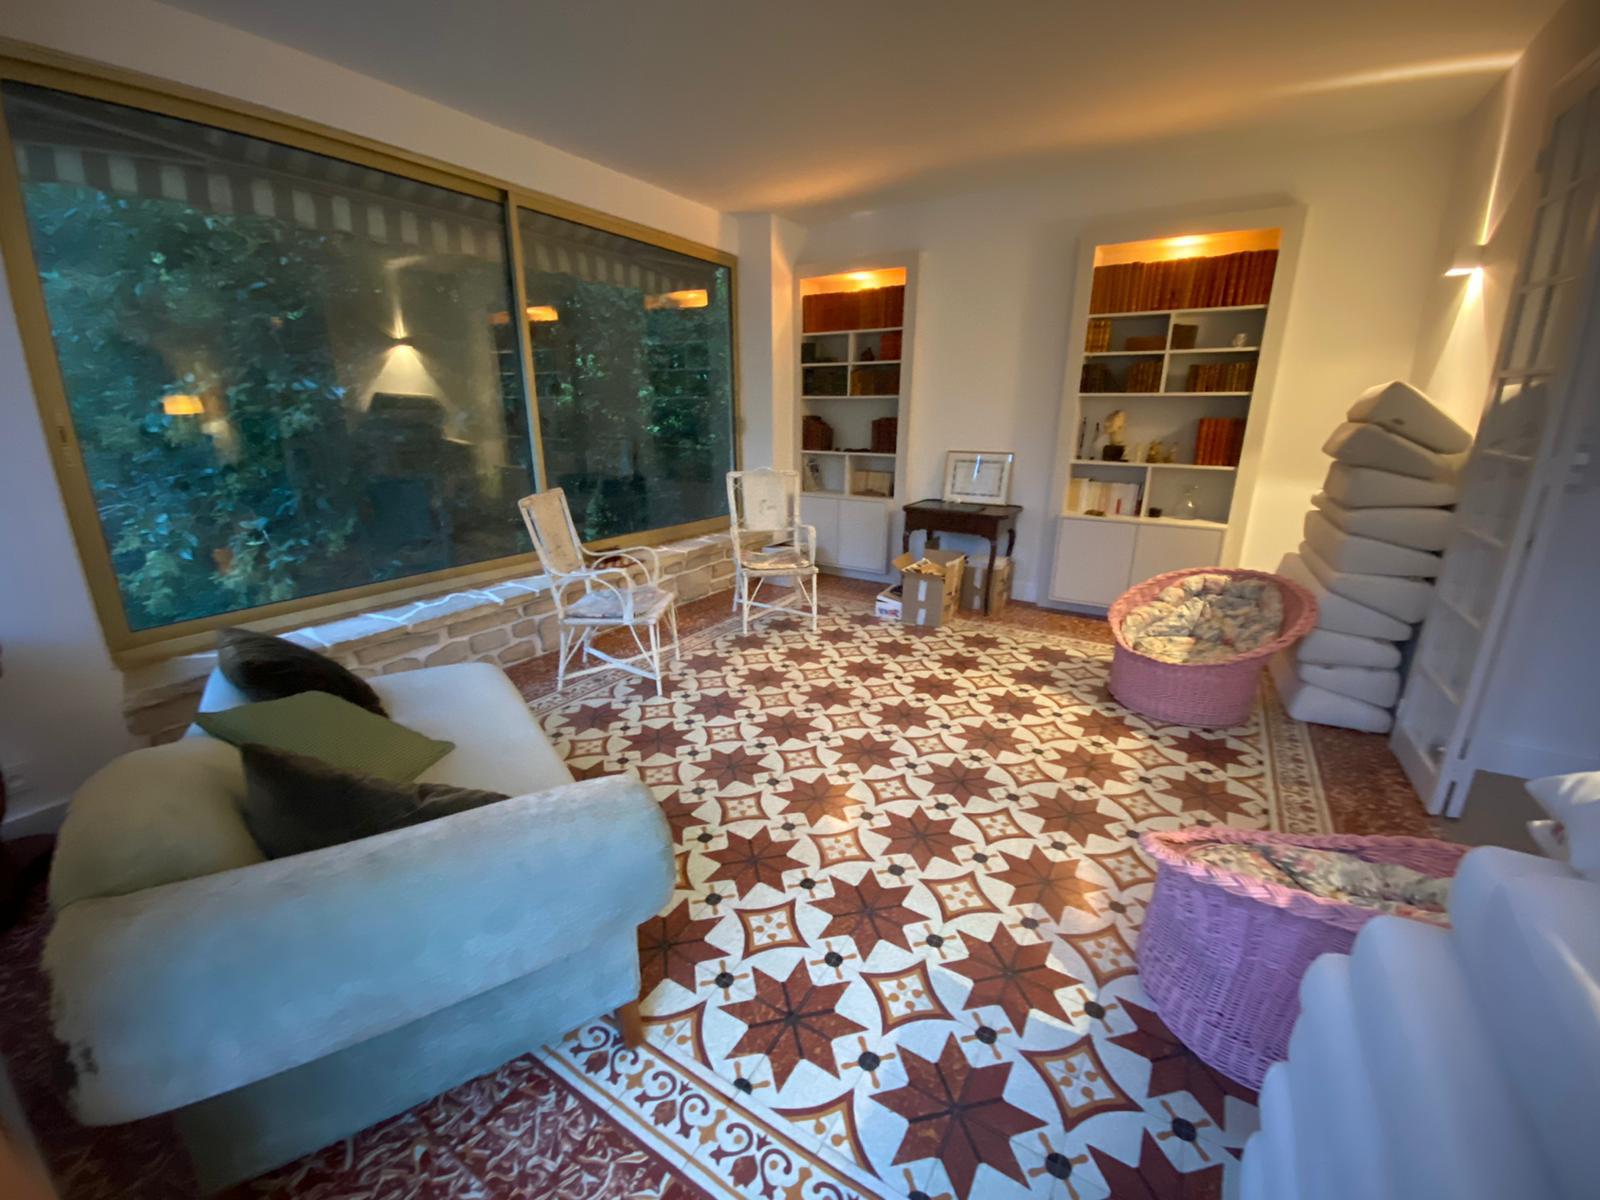 eclairage_spot_encastre_veranda